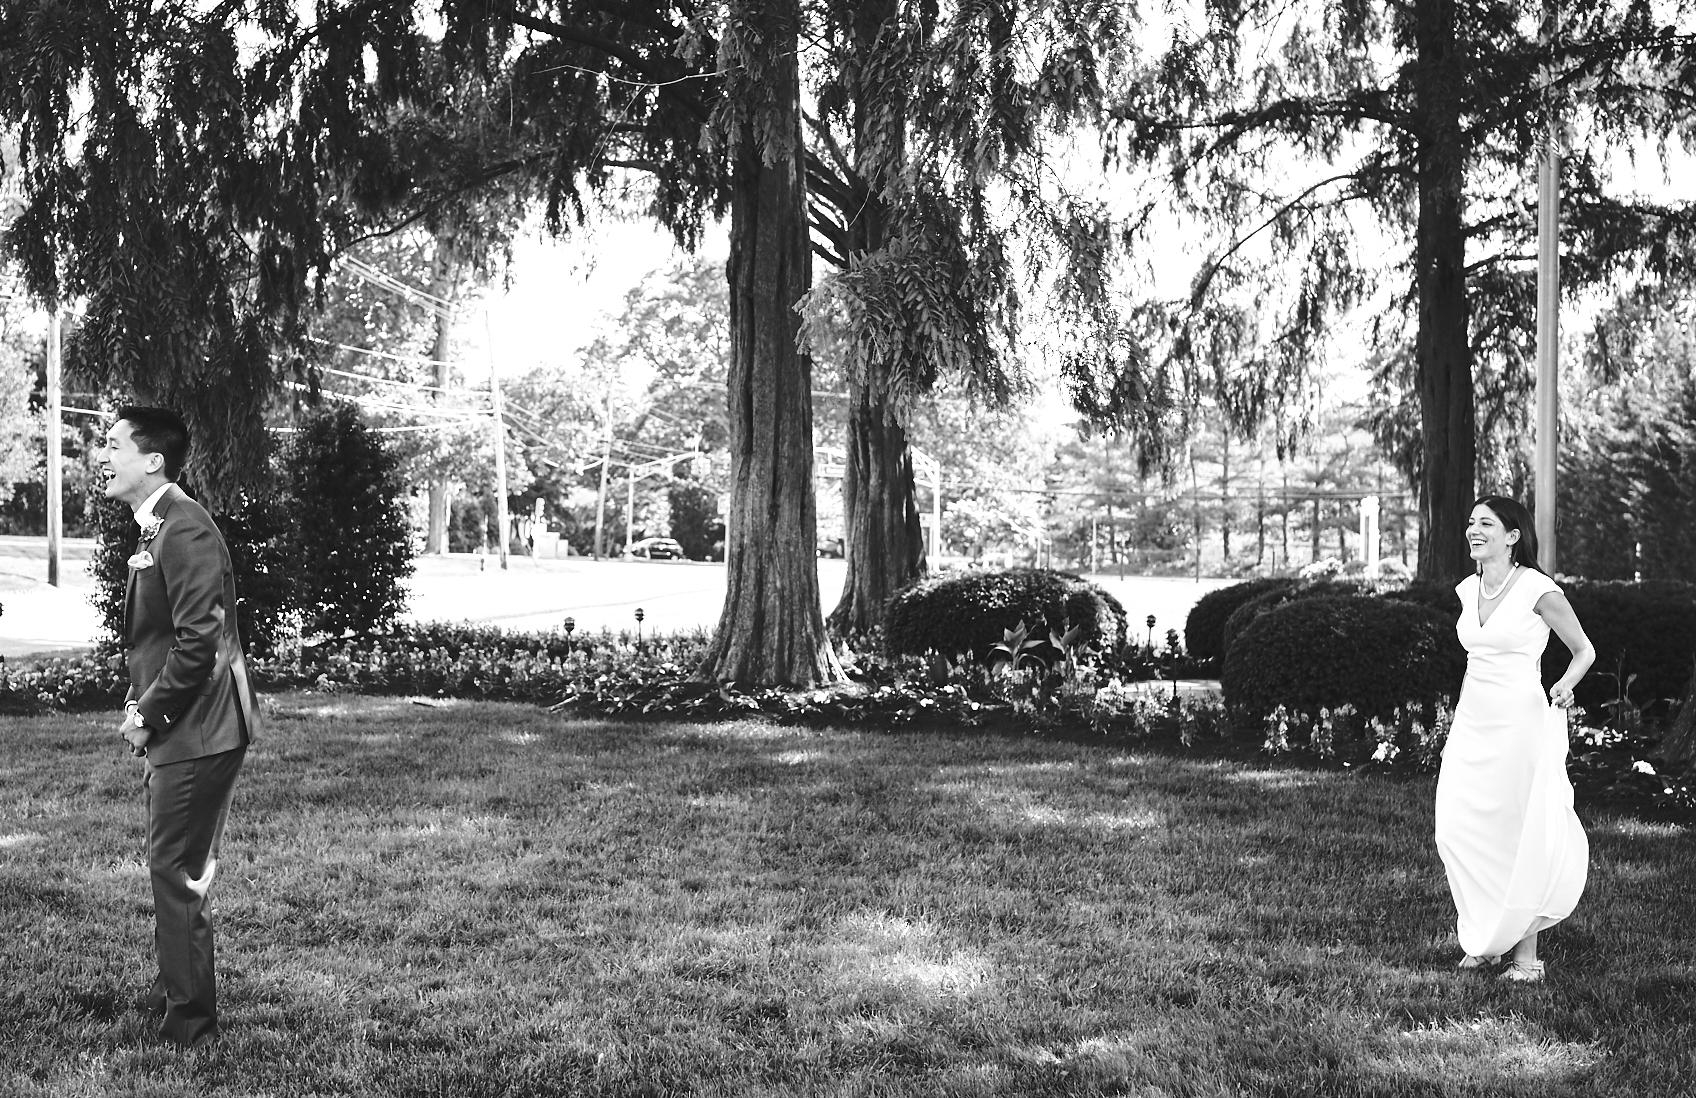 190608_SummerTheMadisonHotelWeddingPhotography_By_BriJohnsonWeddings_0041.jpg